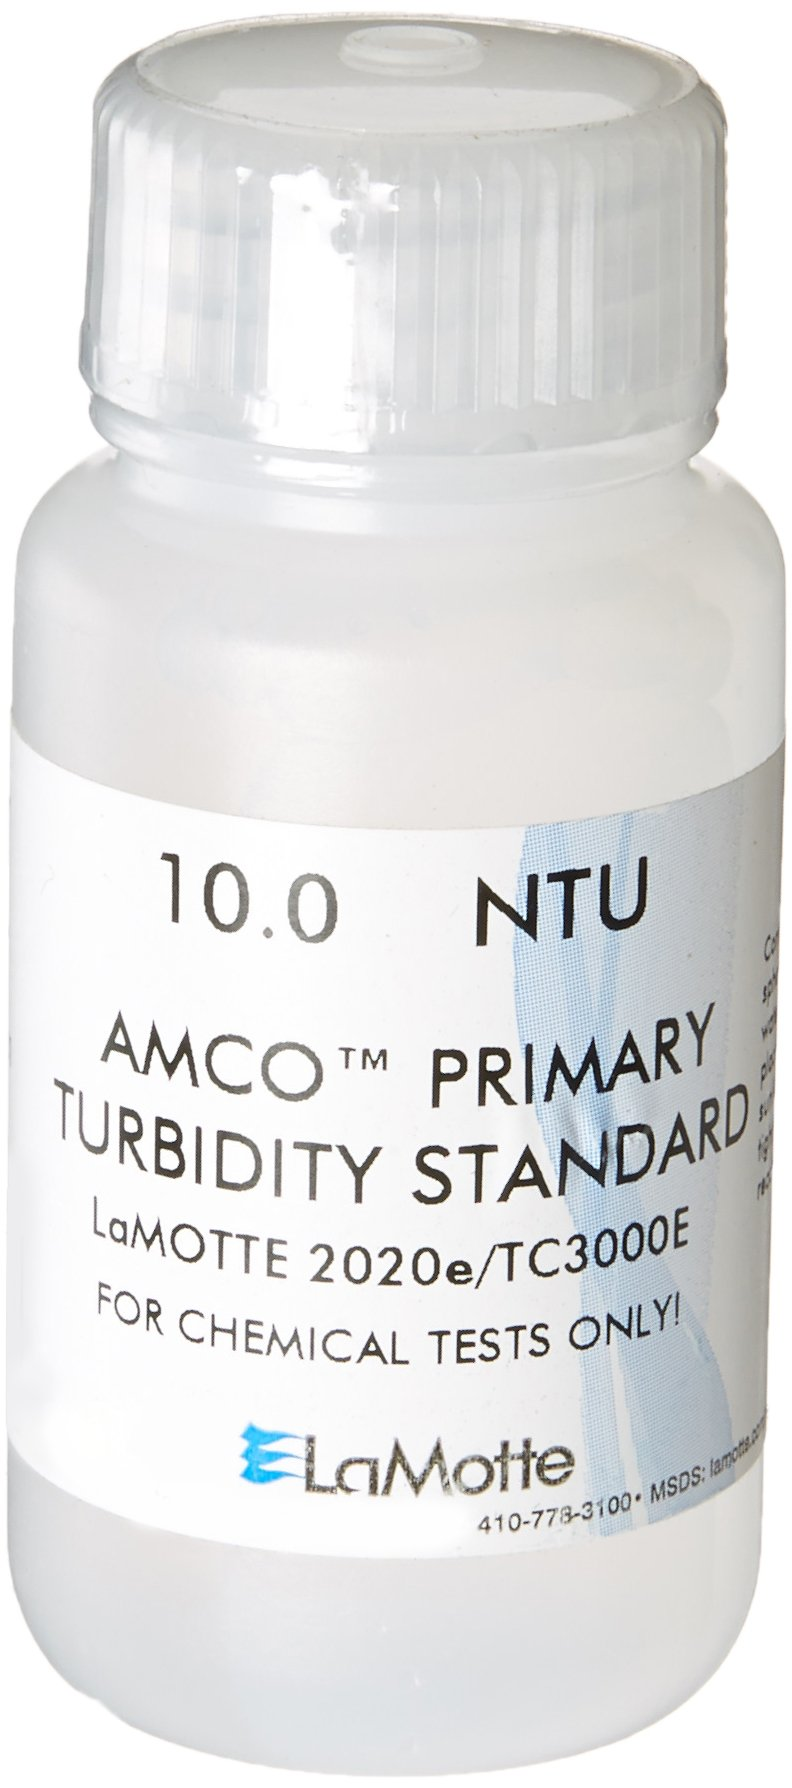 LaMotte 1485 Turbidity Standard (EPA) for 2020E/TC-3000E Turbidity Meter, 10 NTU, 60ml Volume by LaMotte